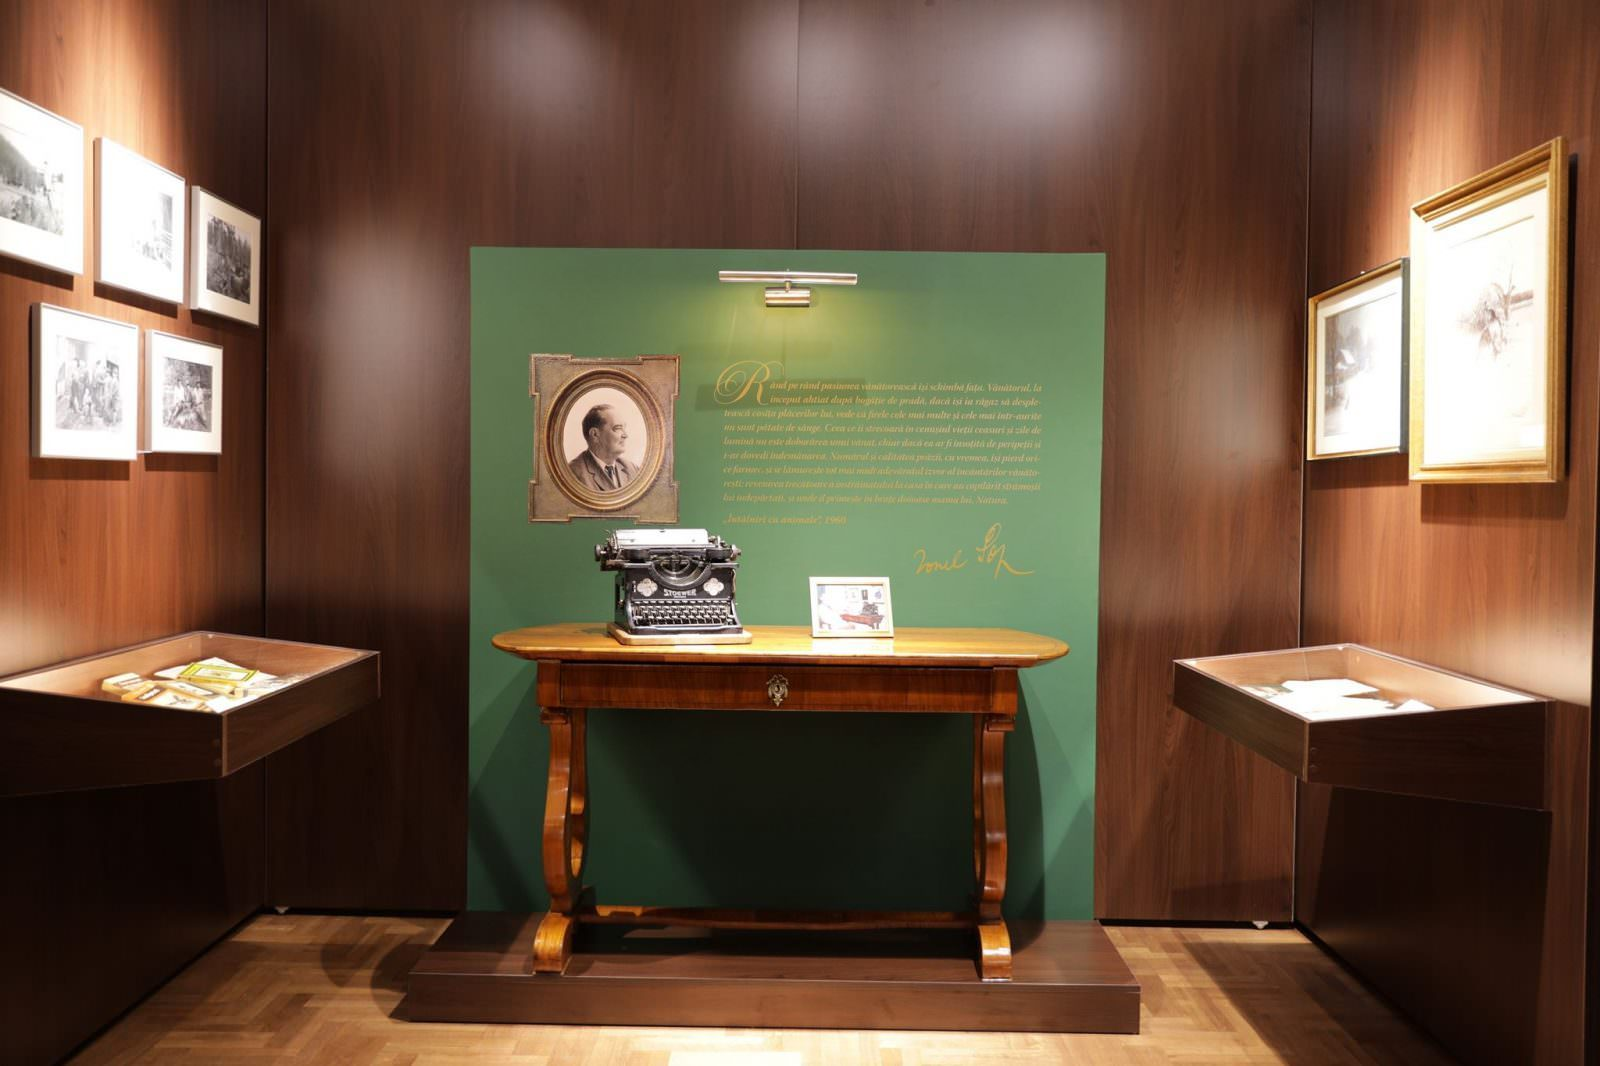 muzeul cinegetic expozitie 4